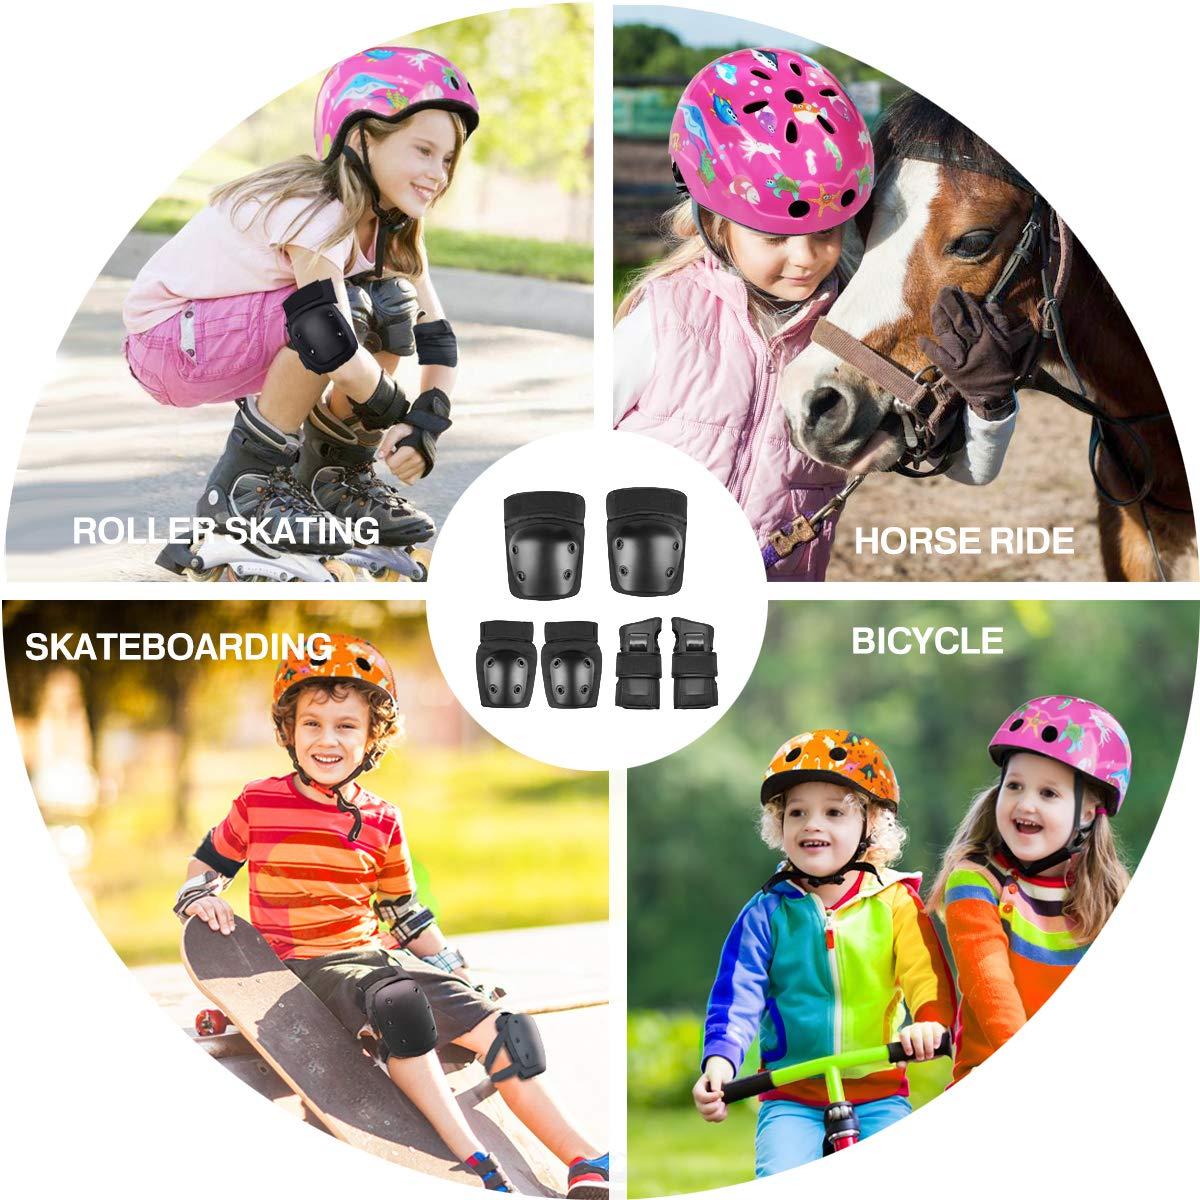 Monopat/ín Wasan Protecciones de Patinaje Patinar Bicicleta BMX Actividades al Aire Libre para Ni/ños /& Adultos Aeropat/ín 6pcs Coderas Rodilleras Mu/ñequeras para Rodillo